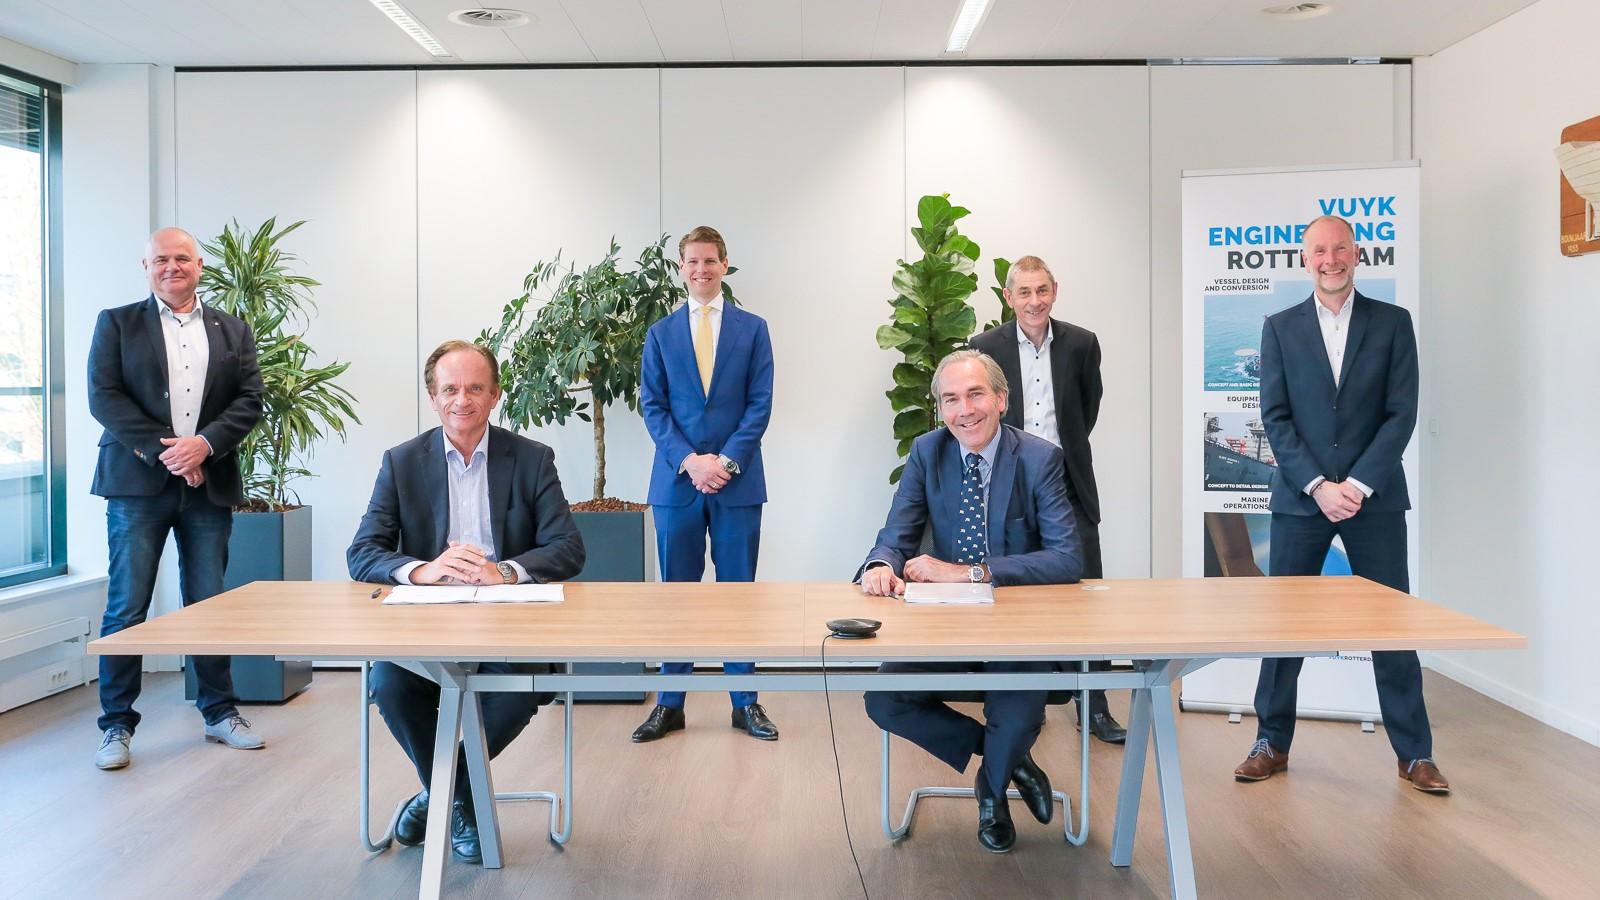 Royal Doeksen takes over Vuyk Engineering Rotterdam from Royal IHC